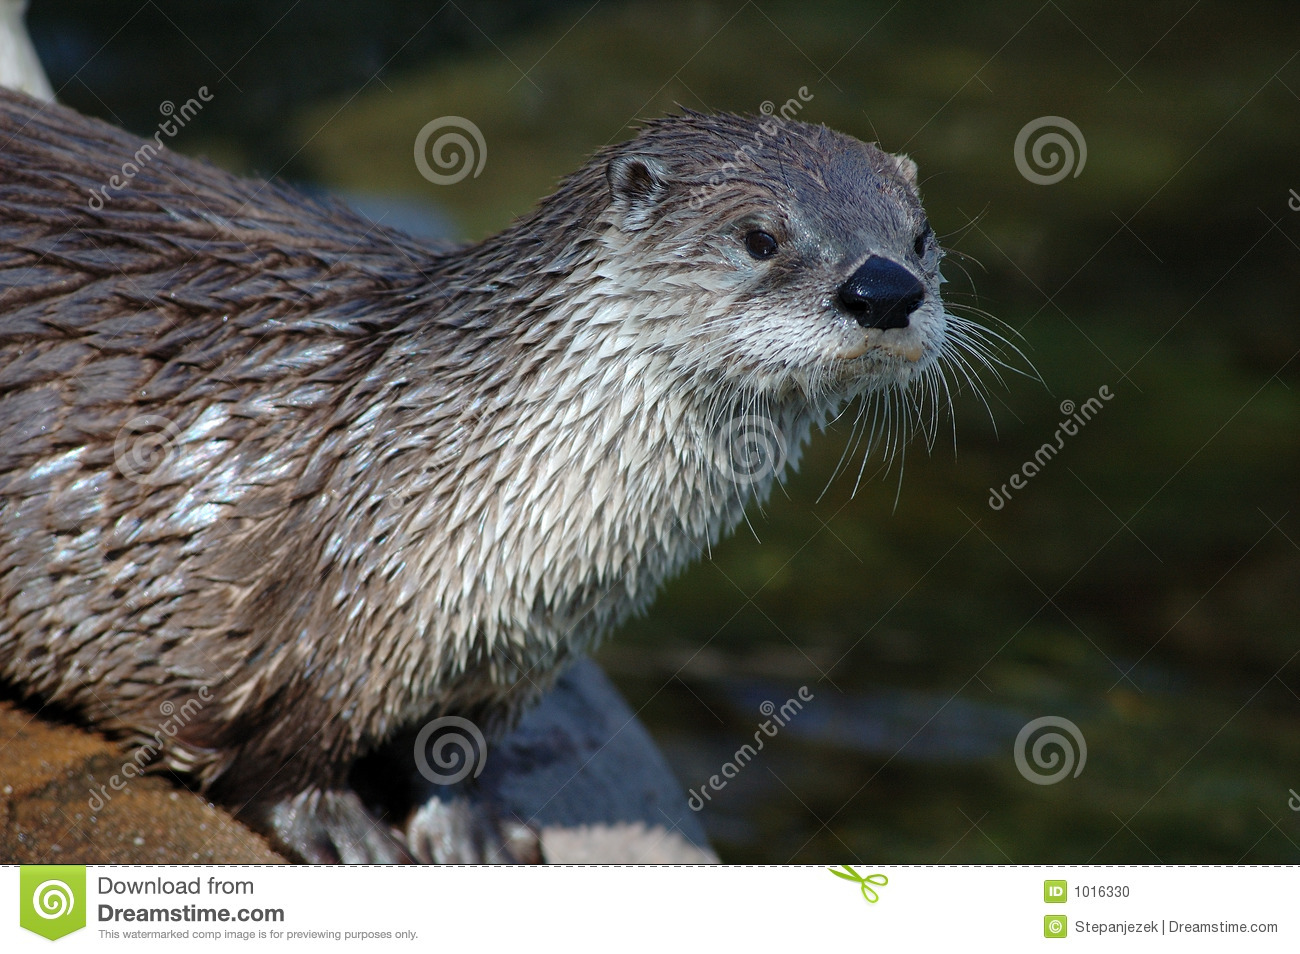 Download Dmca River Otter Nashville Tennessee Wallpaper 1600 X 1200 1300x954